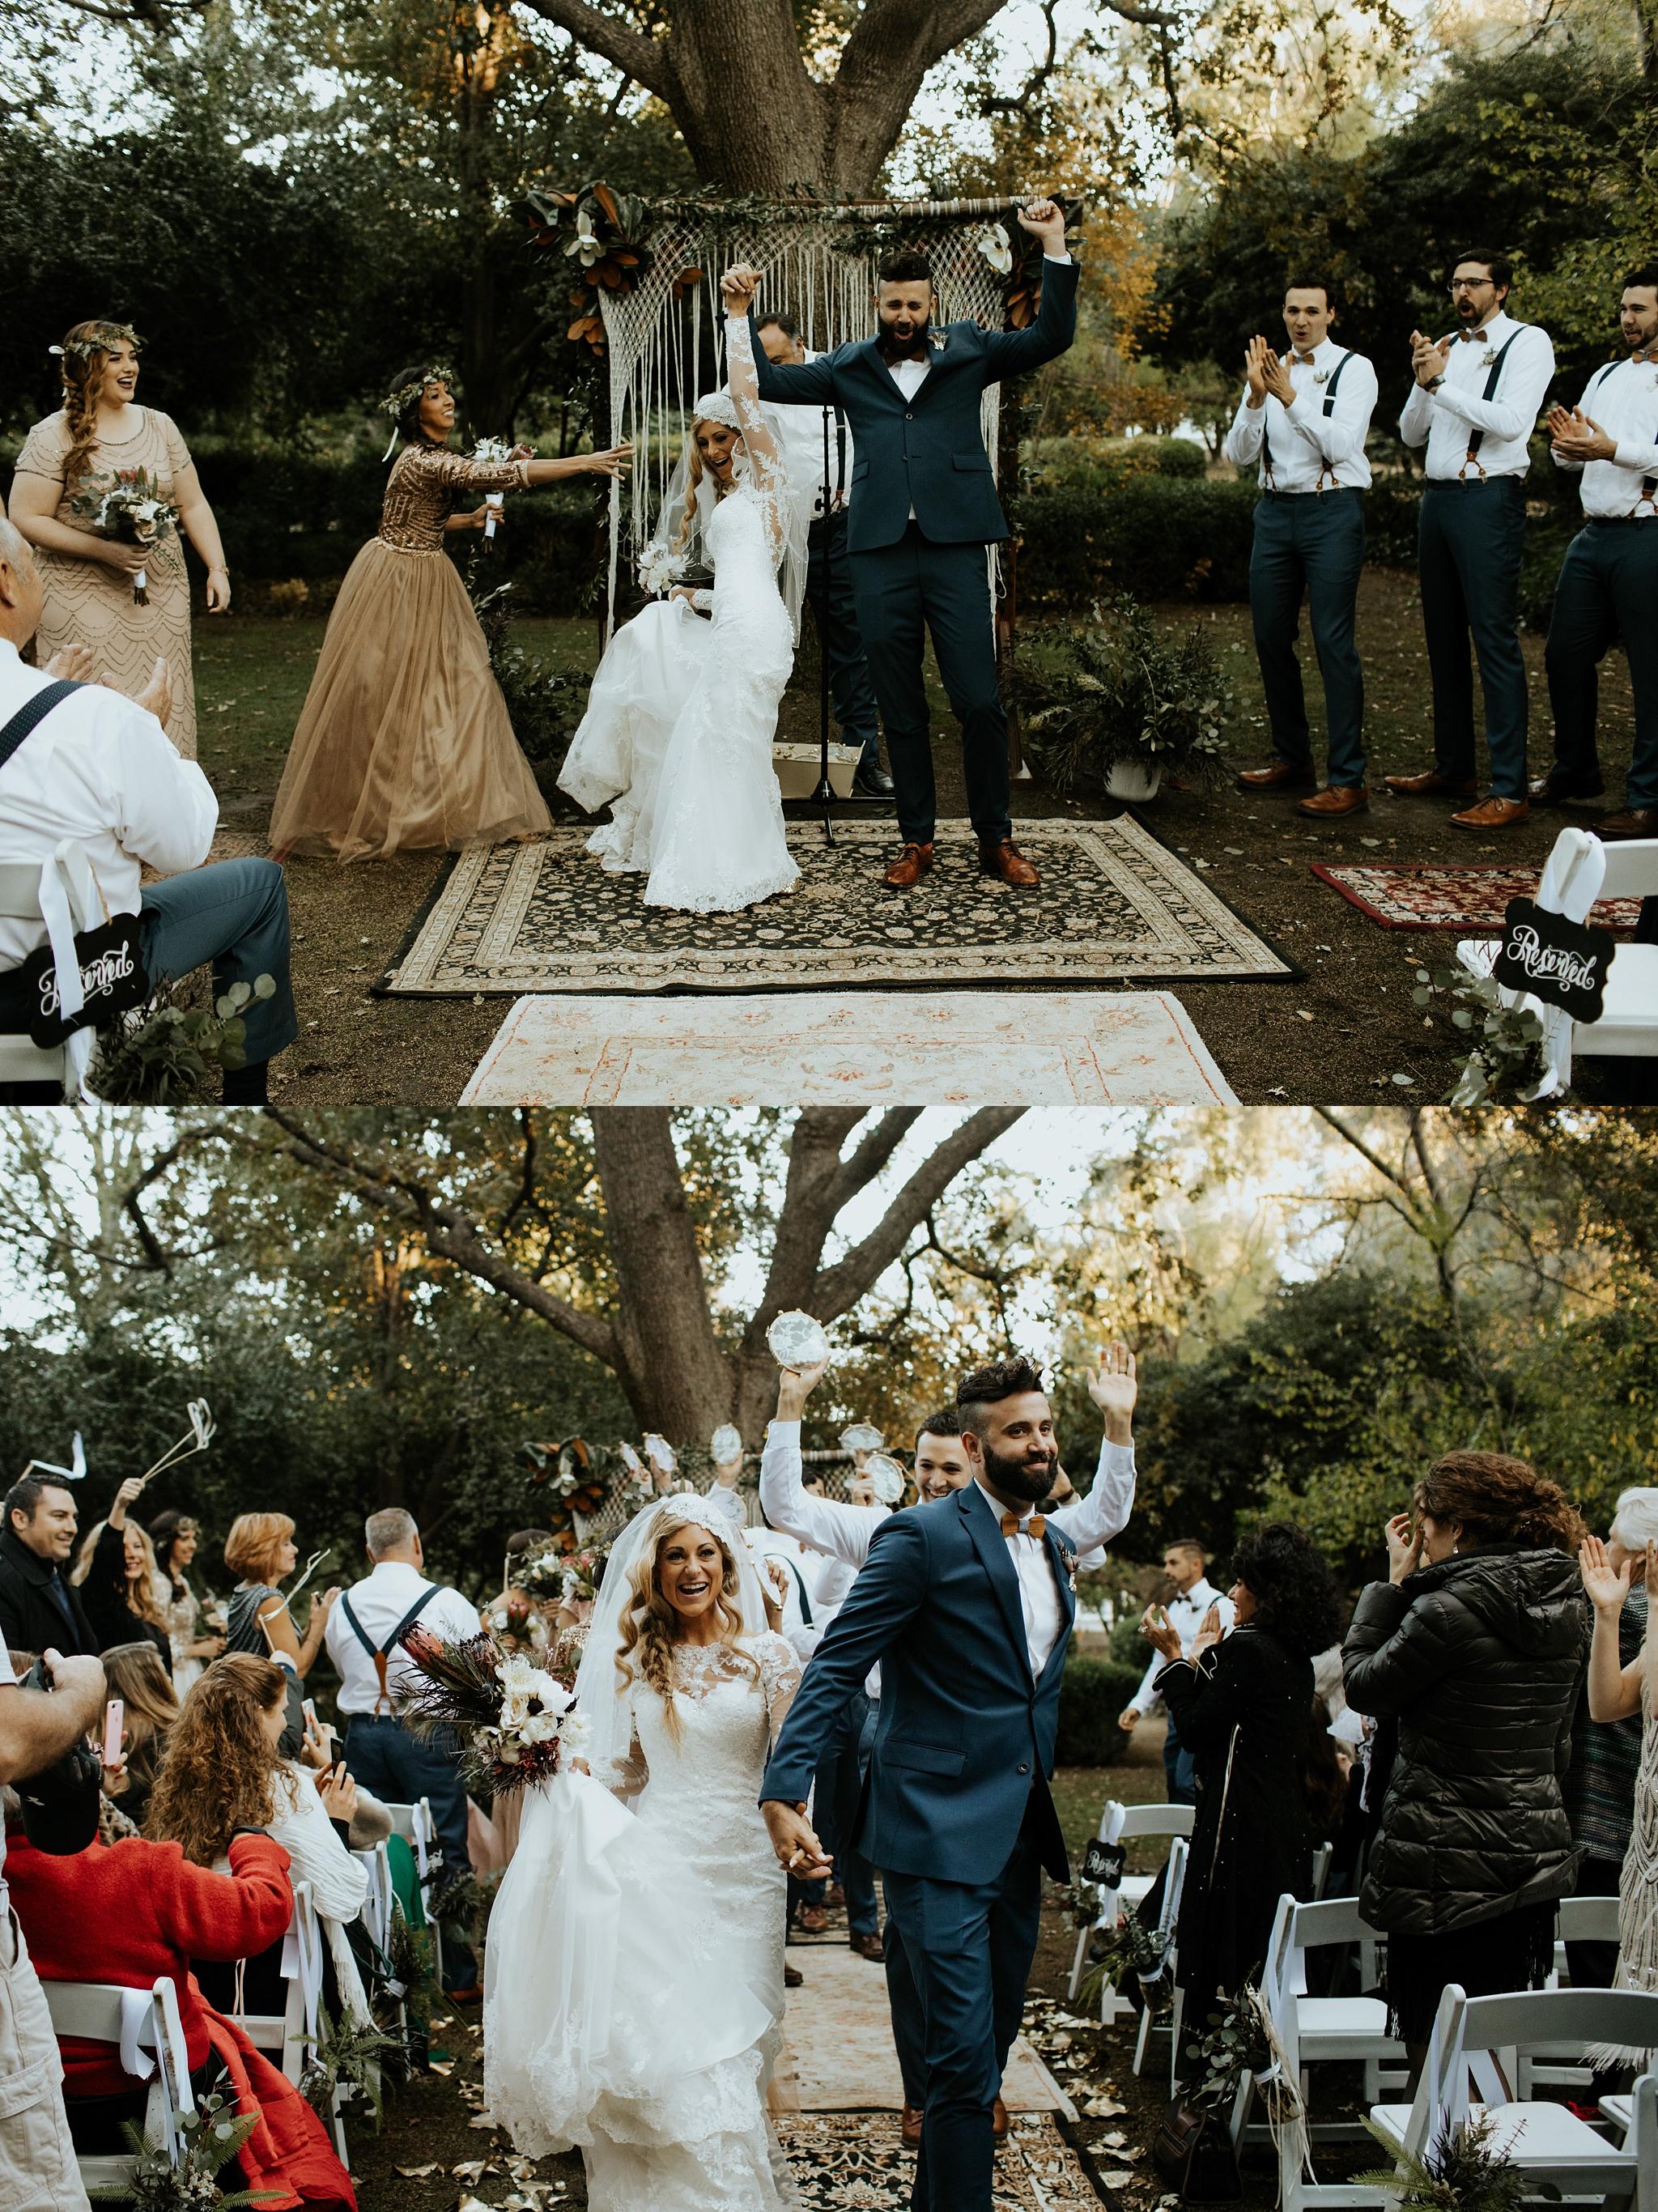 Bohemian Orcutt Ranch Wedding in Los Angeles California  - Los Angeles Californai Wedding Photographer_0038.jpg